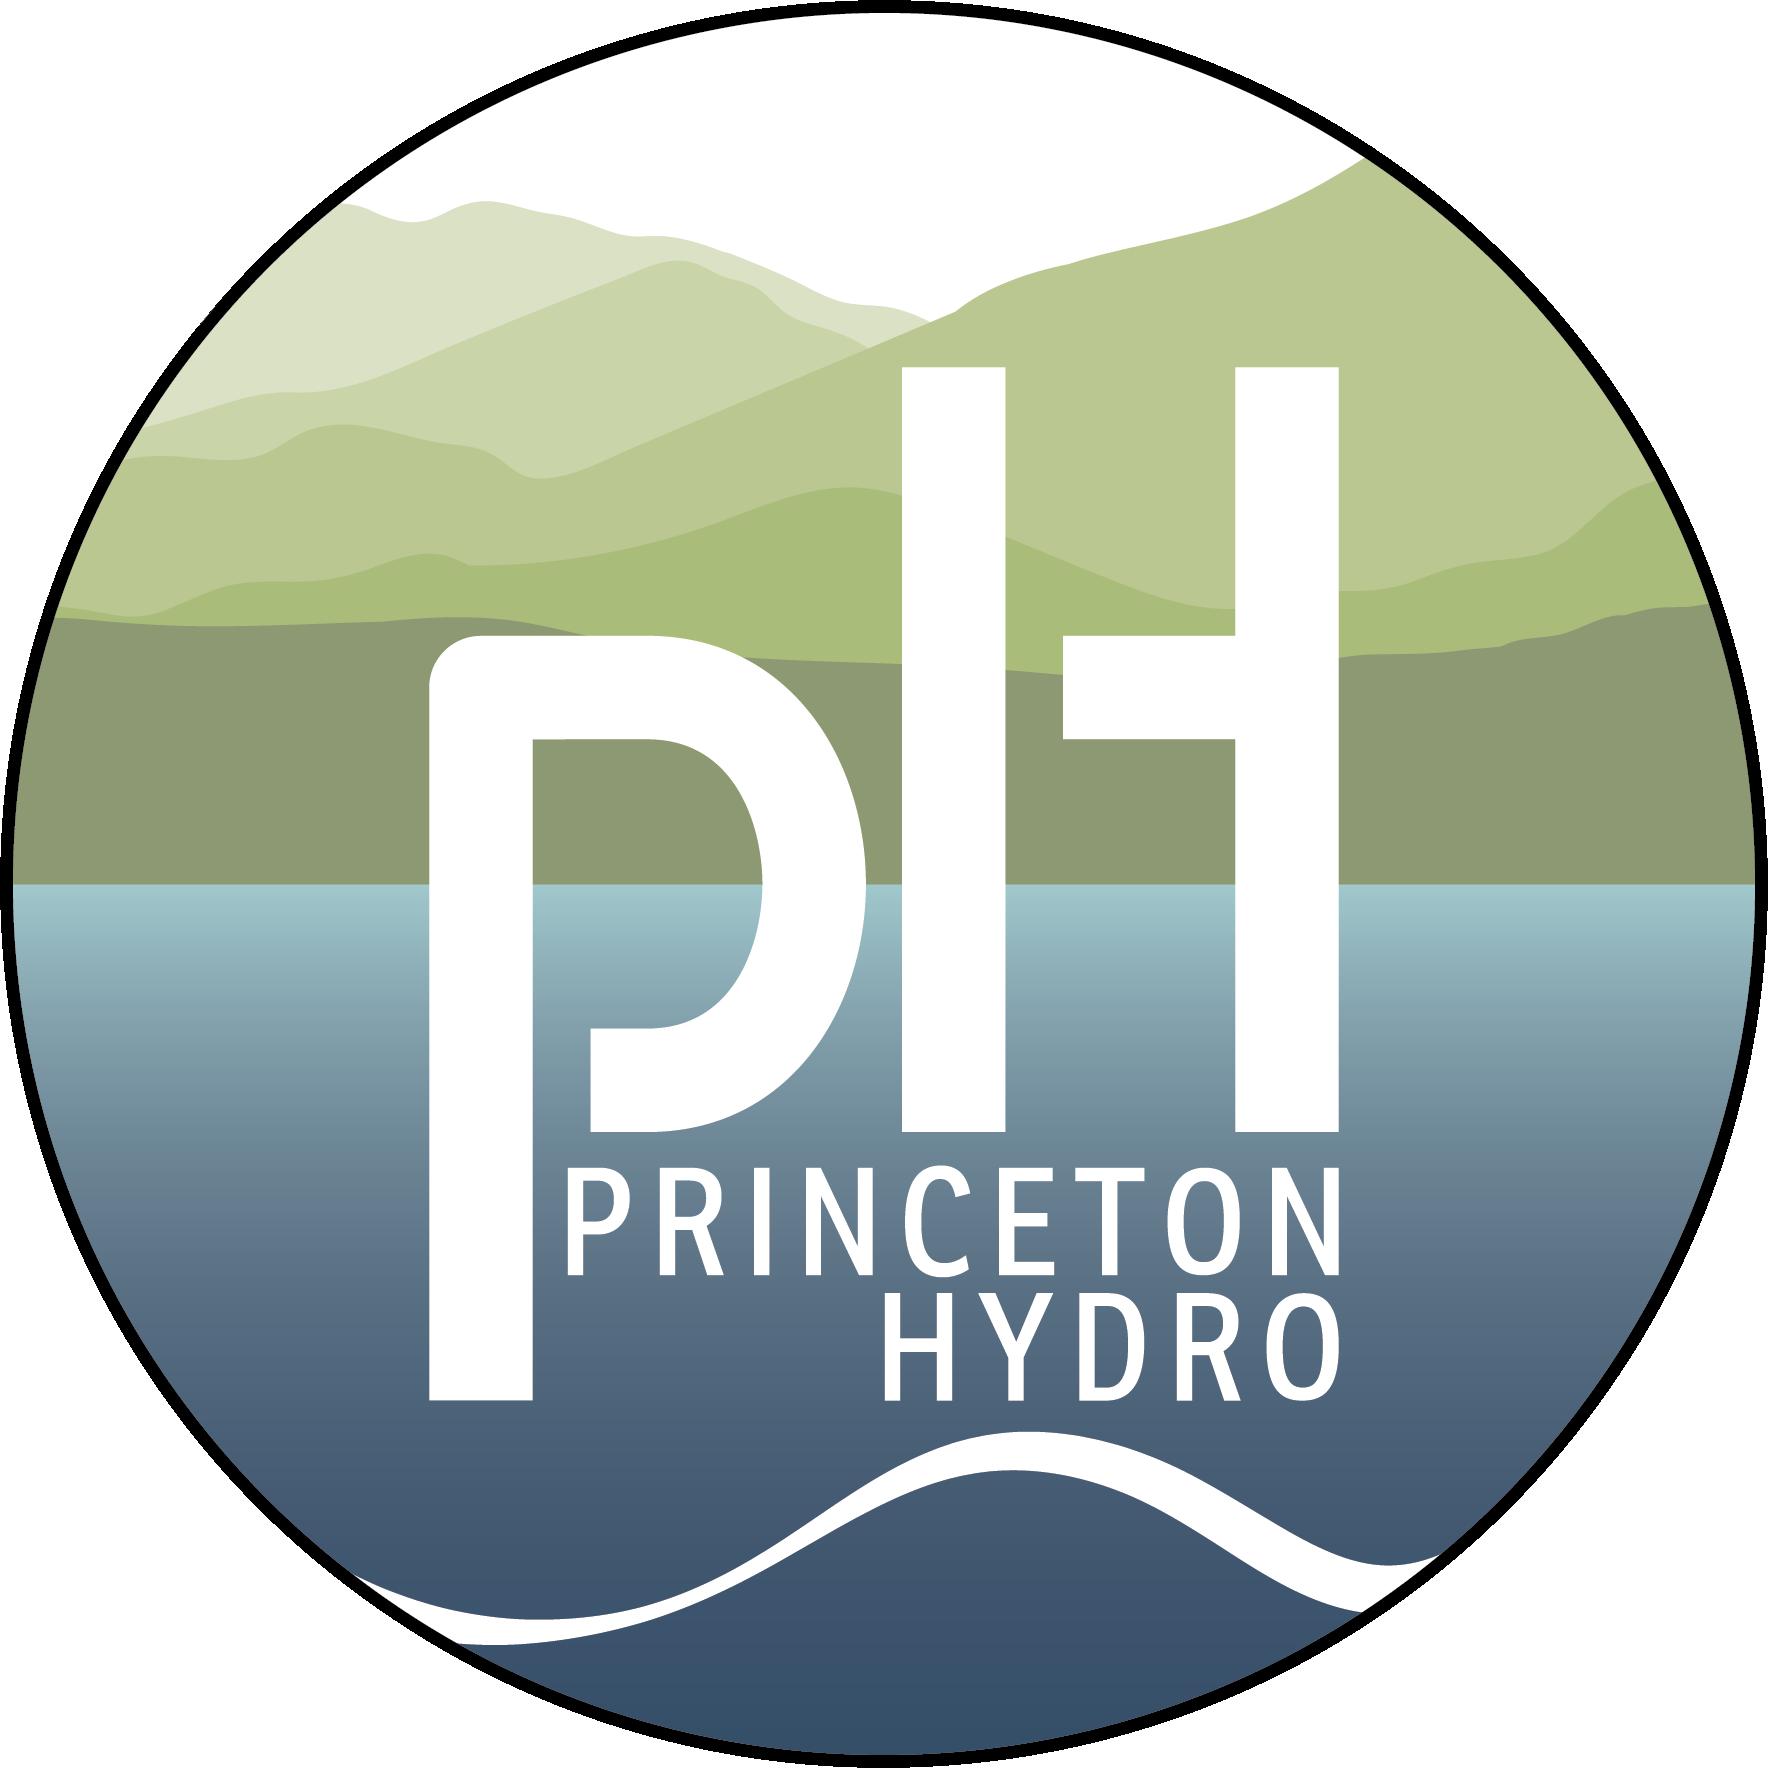 Princeton Hydro 2019